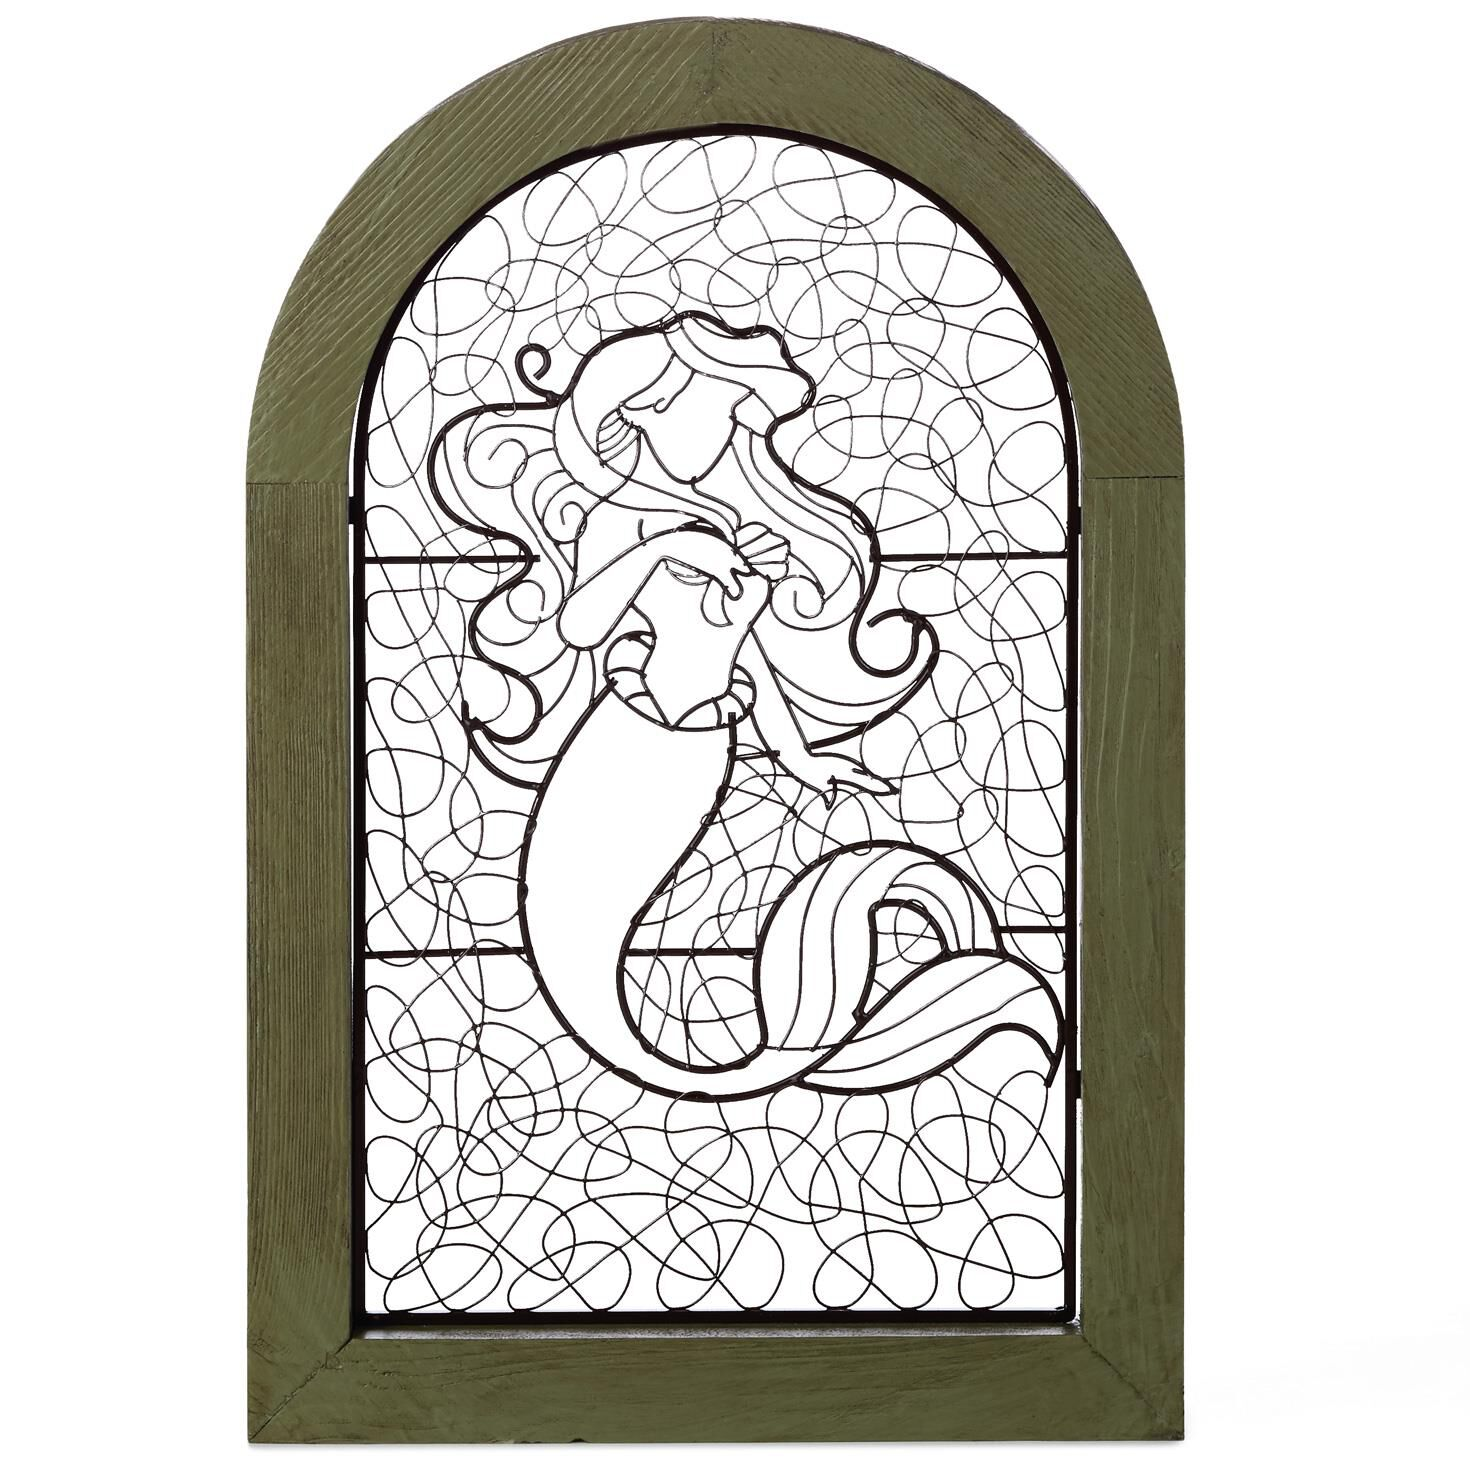 the little mermaid ariel wire art in distressed frame 12x18 framed art u0026 prints hallmark